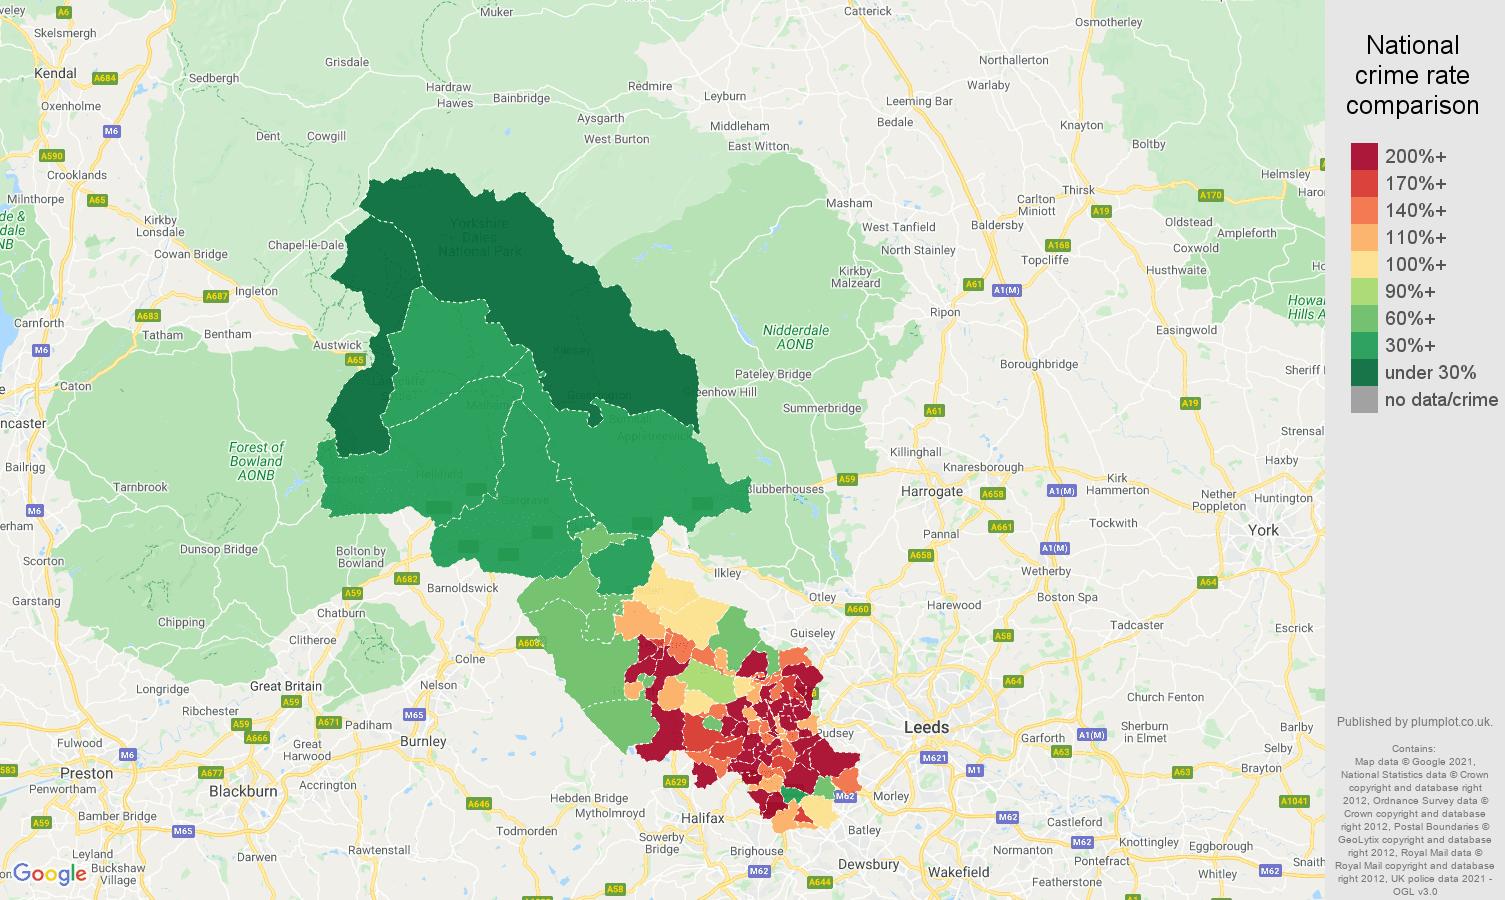 Bradford violent crime rate comparison map